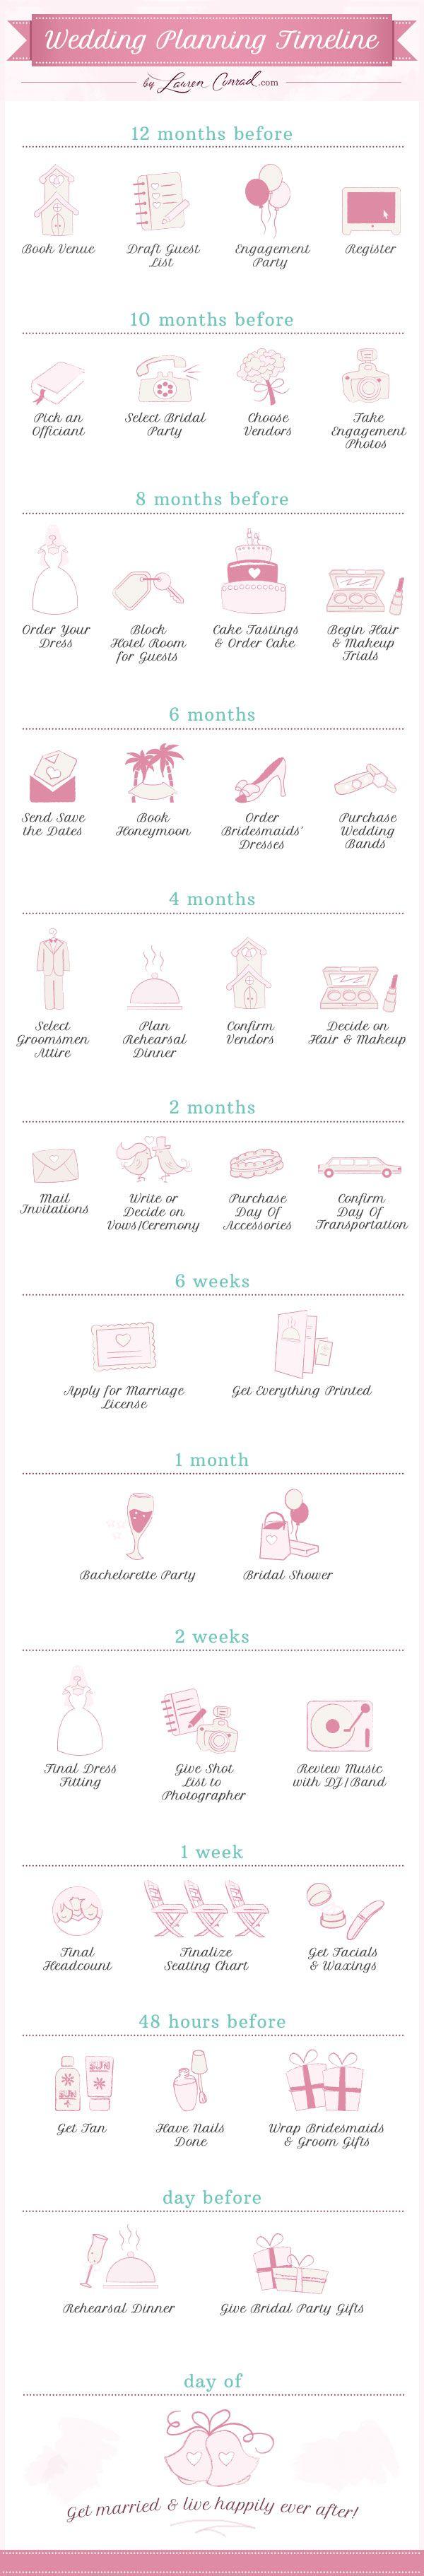 infographic-wedding-planning-timeline